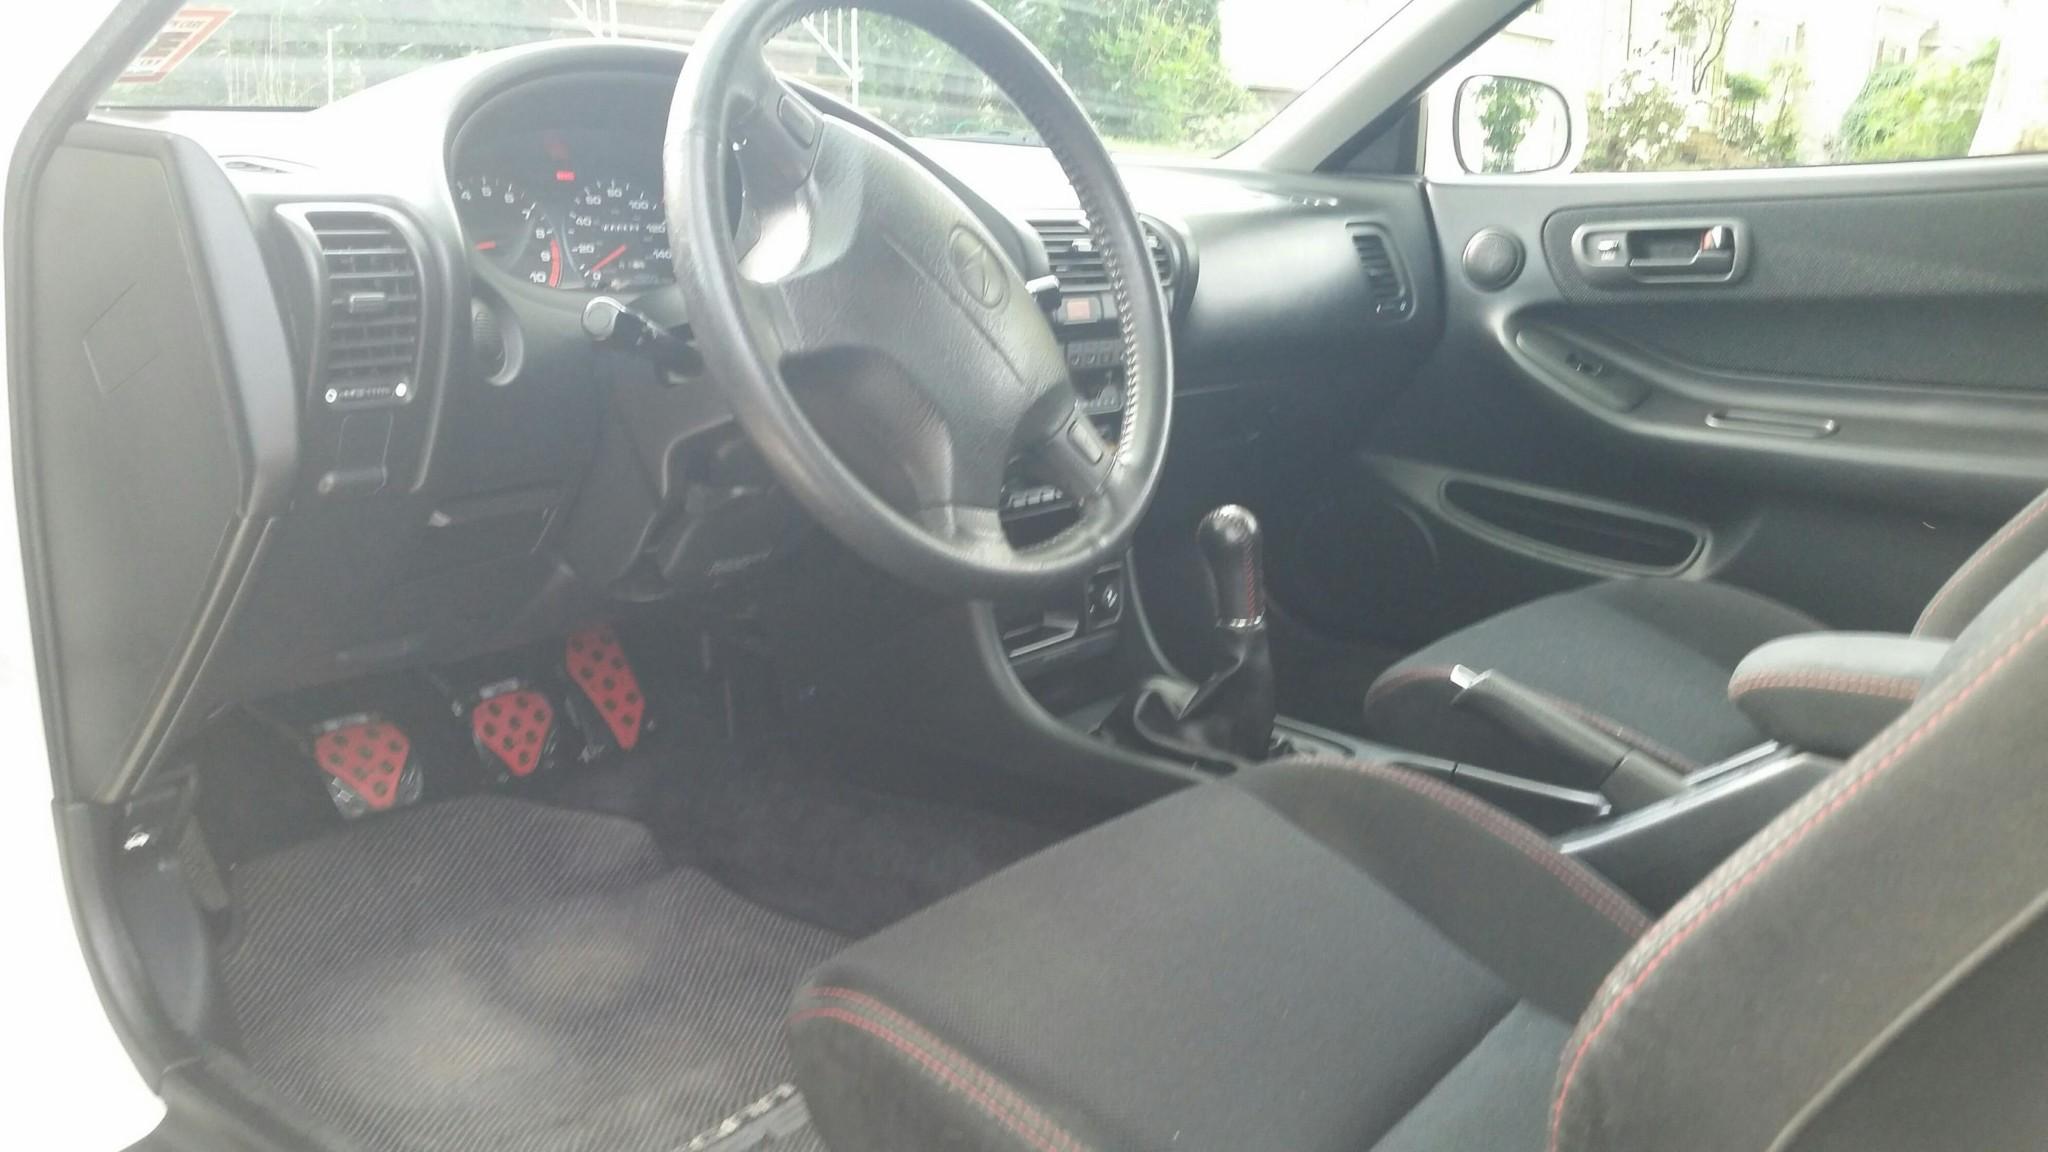 1998 Acura Integra Type R interior